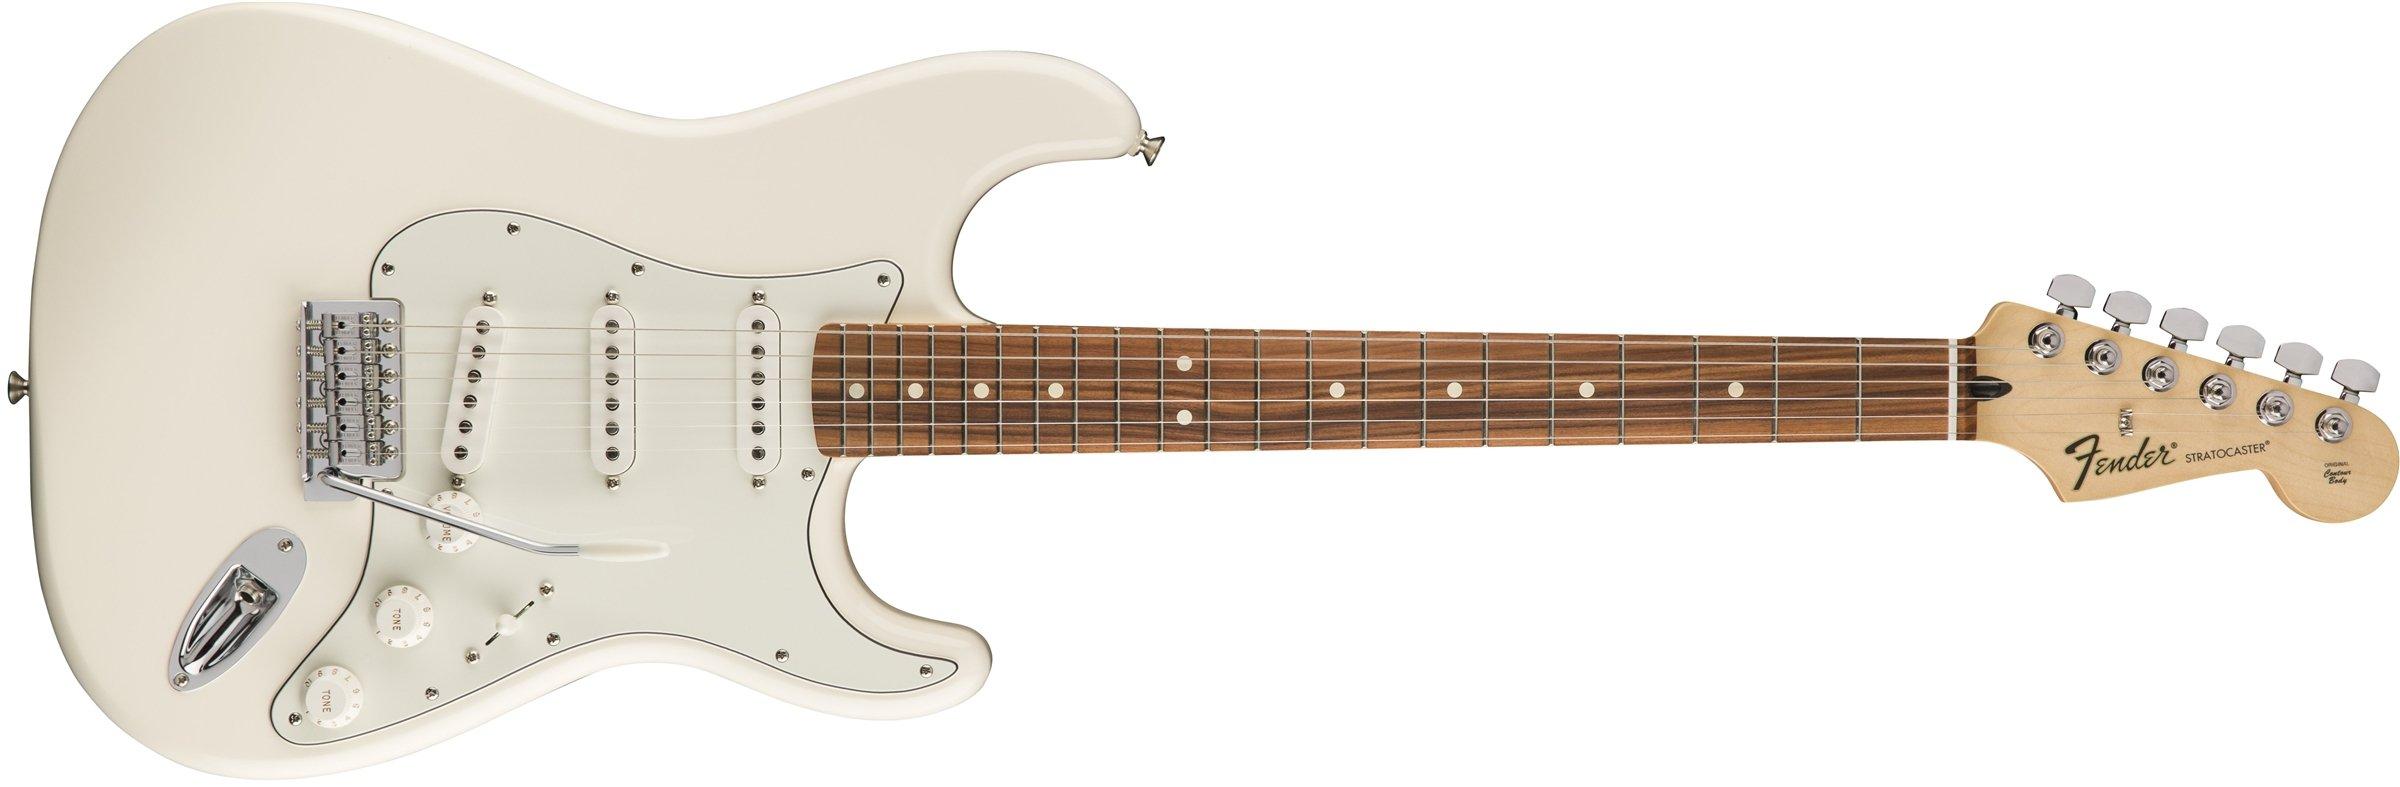 Cheap Fender 6 String Standard Stratocaster Electric Guitar-PAU Ferro Fingerboard Arctic White (144603580) Black Friday & Cyber Monday 2019